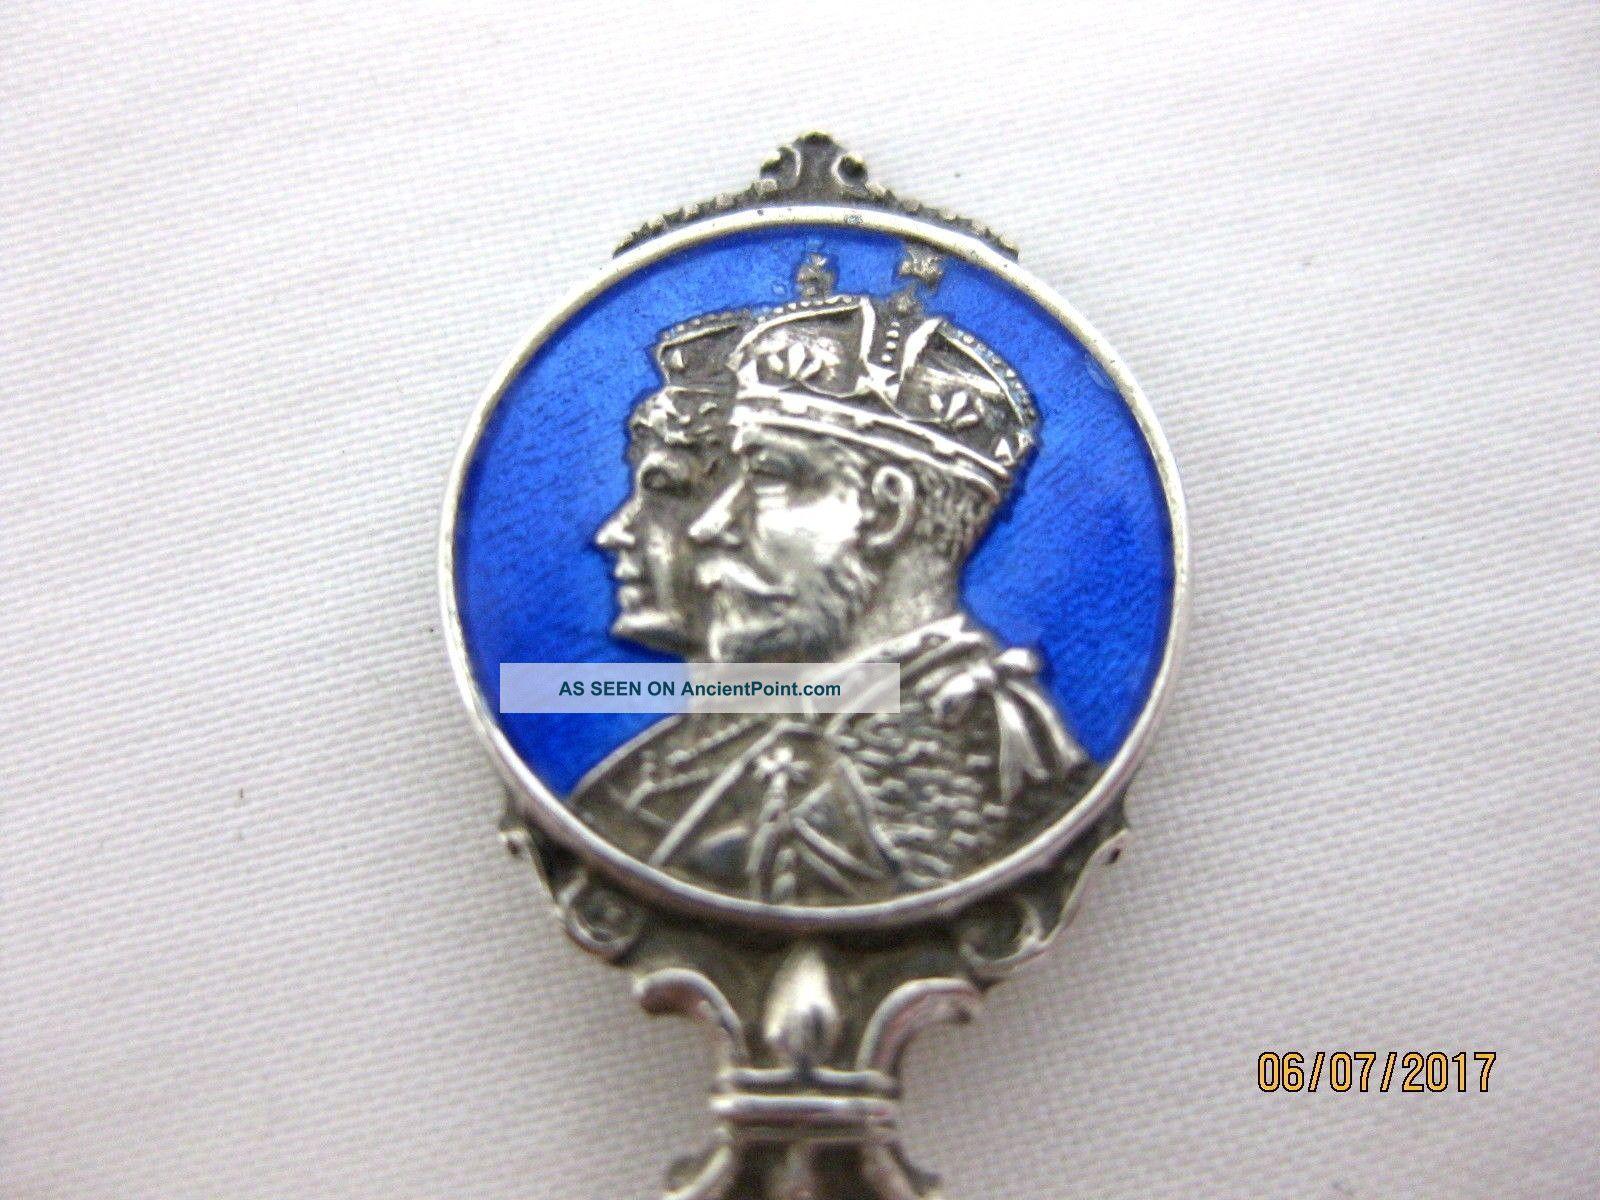 Solid Silver Commemorative Tea Spoon George V Hallmarked Birmingham 1935 Napkin Rings & Clips photo